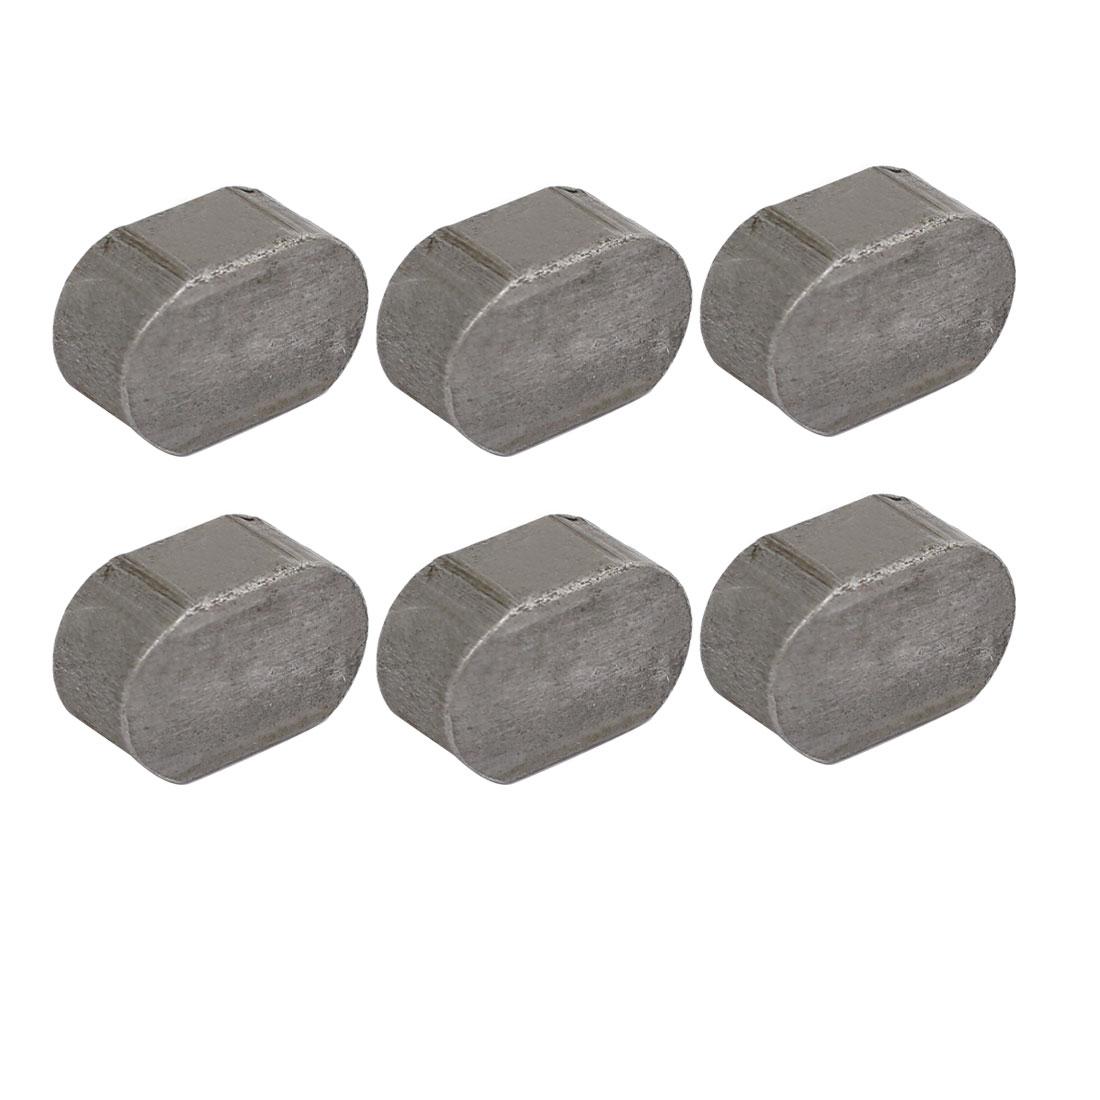 18mmx12mmx8mm Carbon Steel Key Stock To Lock Pulleys 6pcs